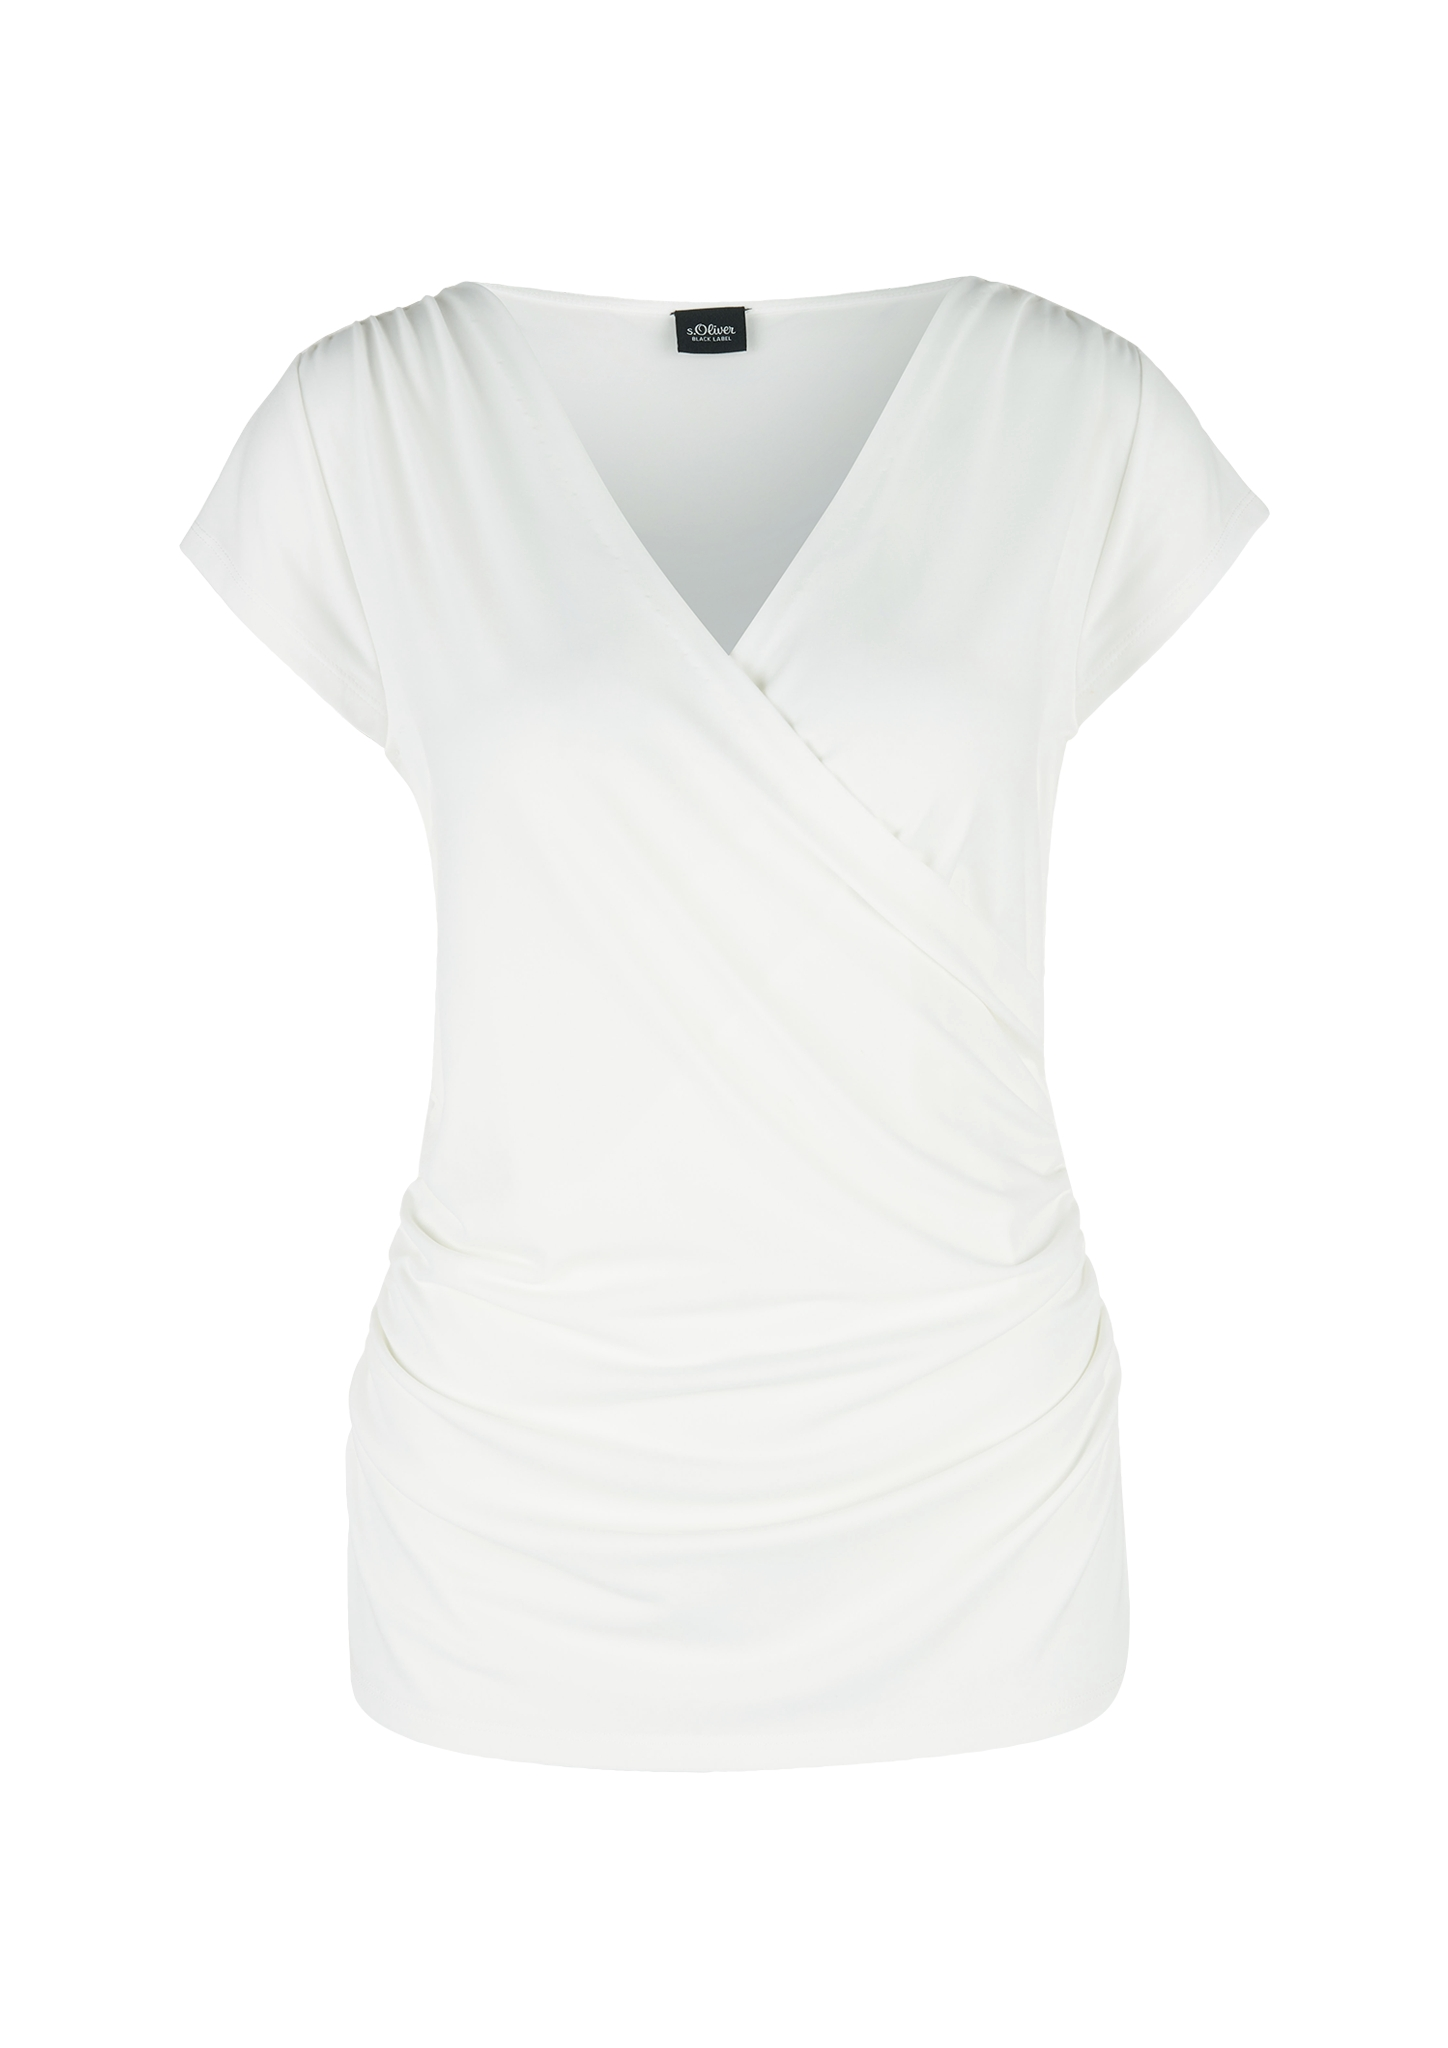 Wickelshirt | Bekleidung > Shirts > Wickelshirts | s.Oliver BLACK LABEL